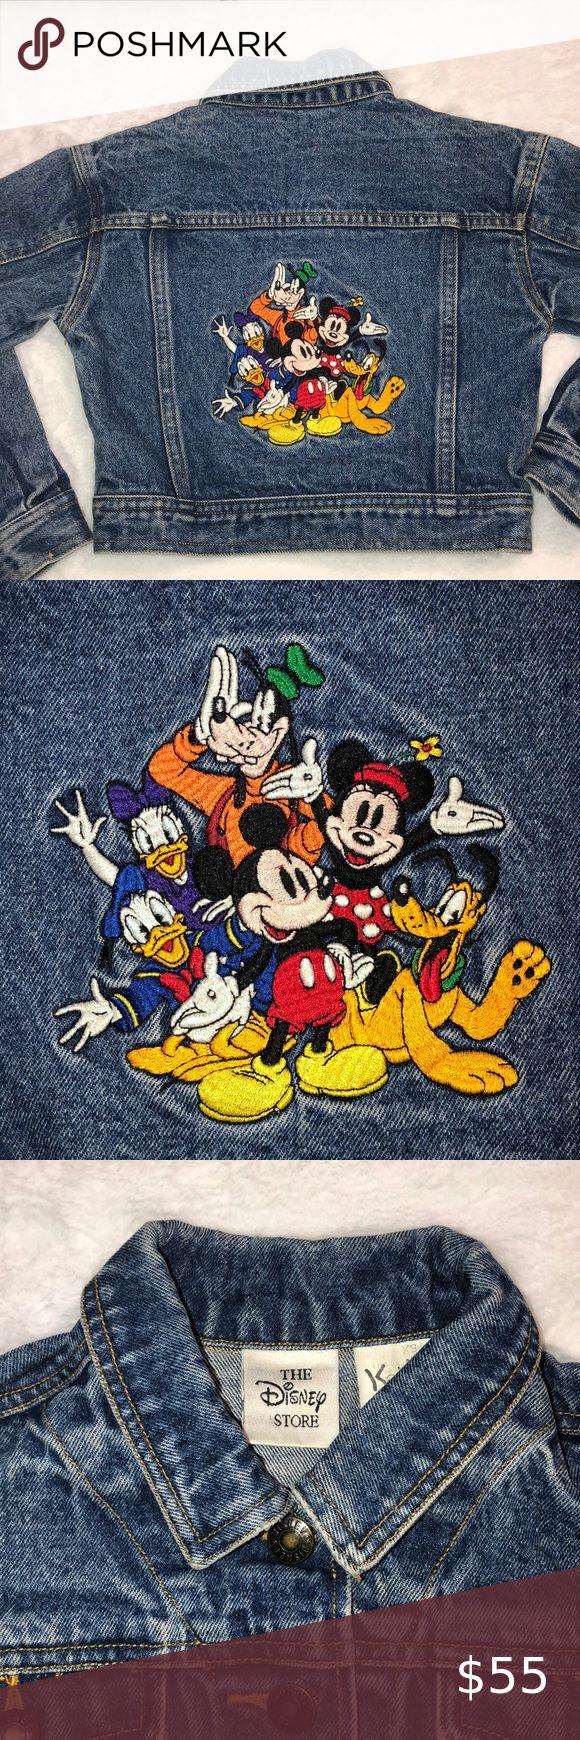 Vintage Disney Denim Jean Jacket Micky And Friends Kids Jeans Jacket Jeans Kids Ralph Lauren Baby Girl [ 1740 x 580 Pixel ]